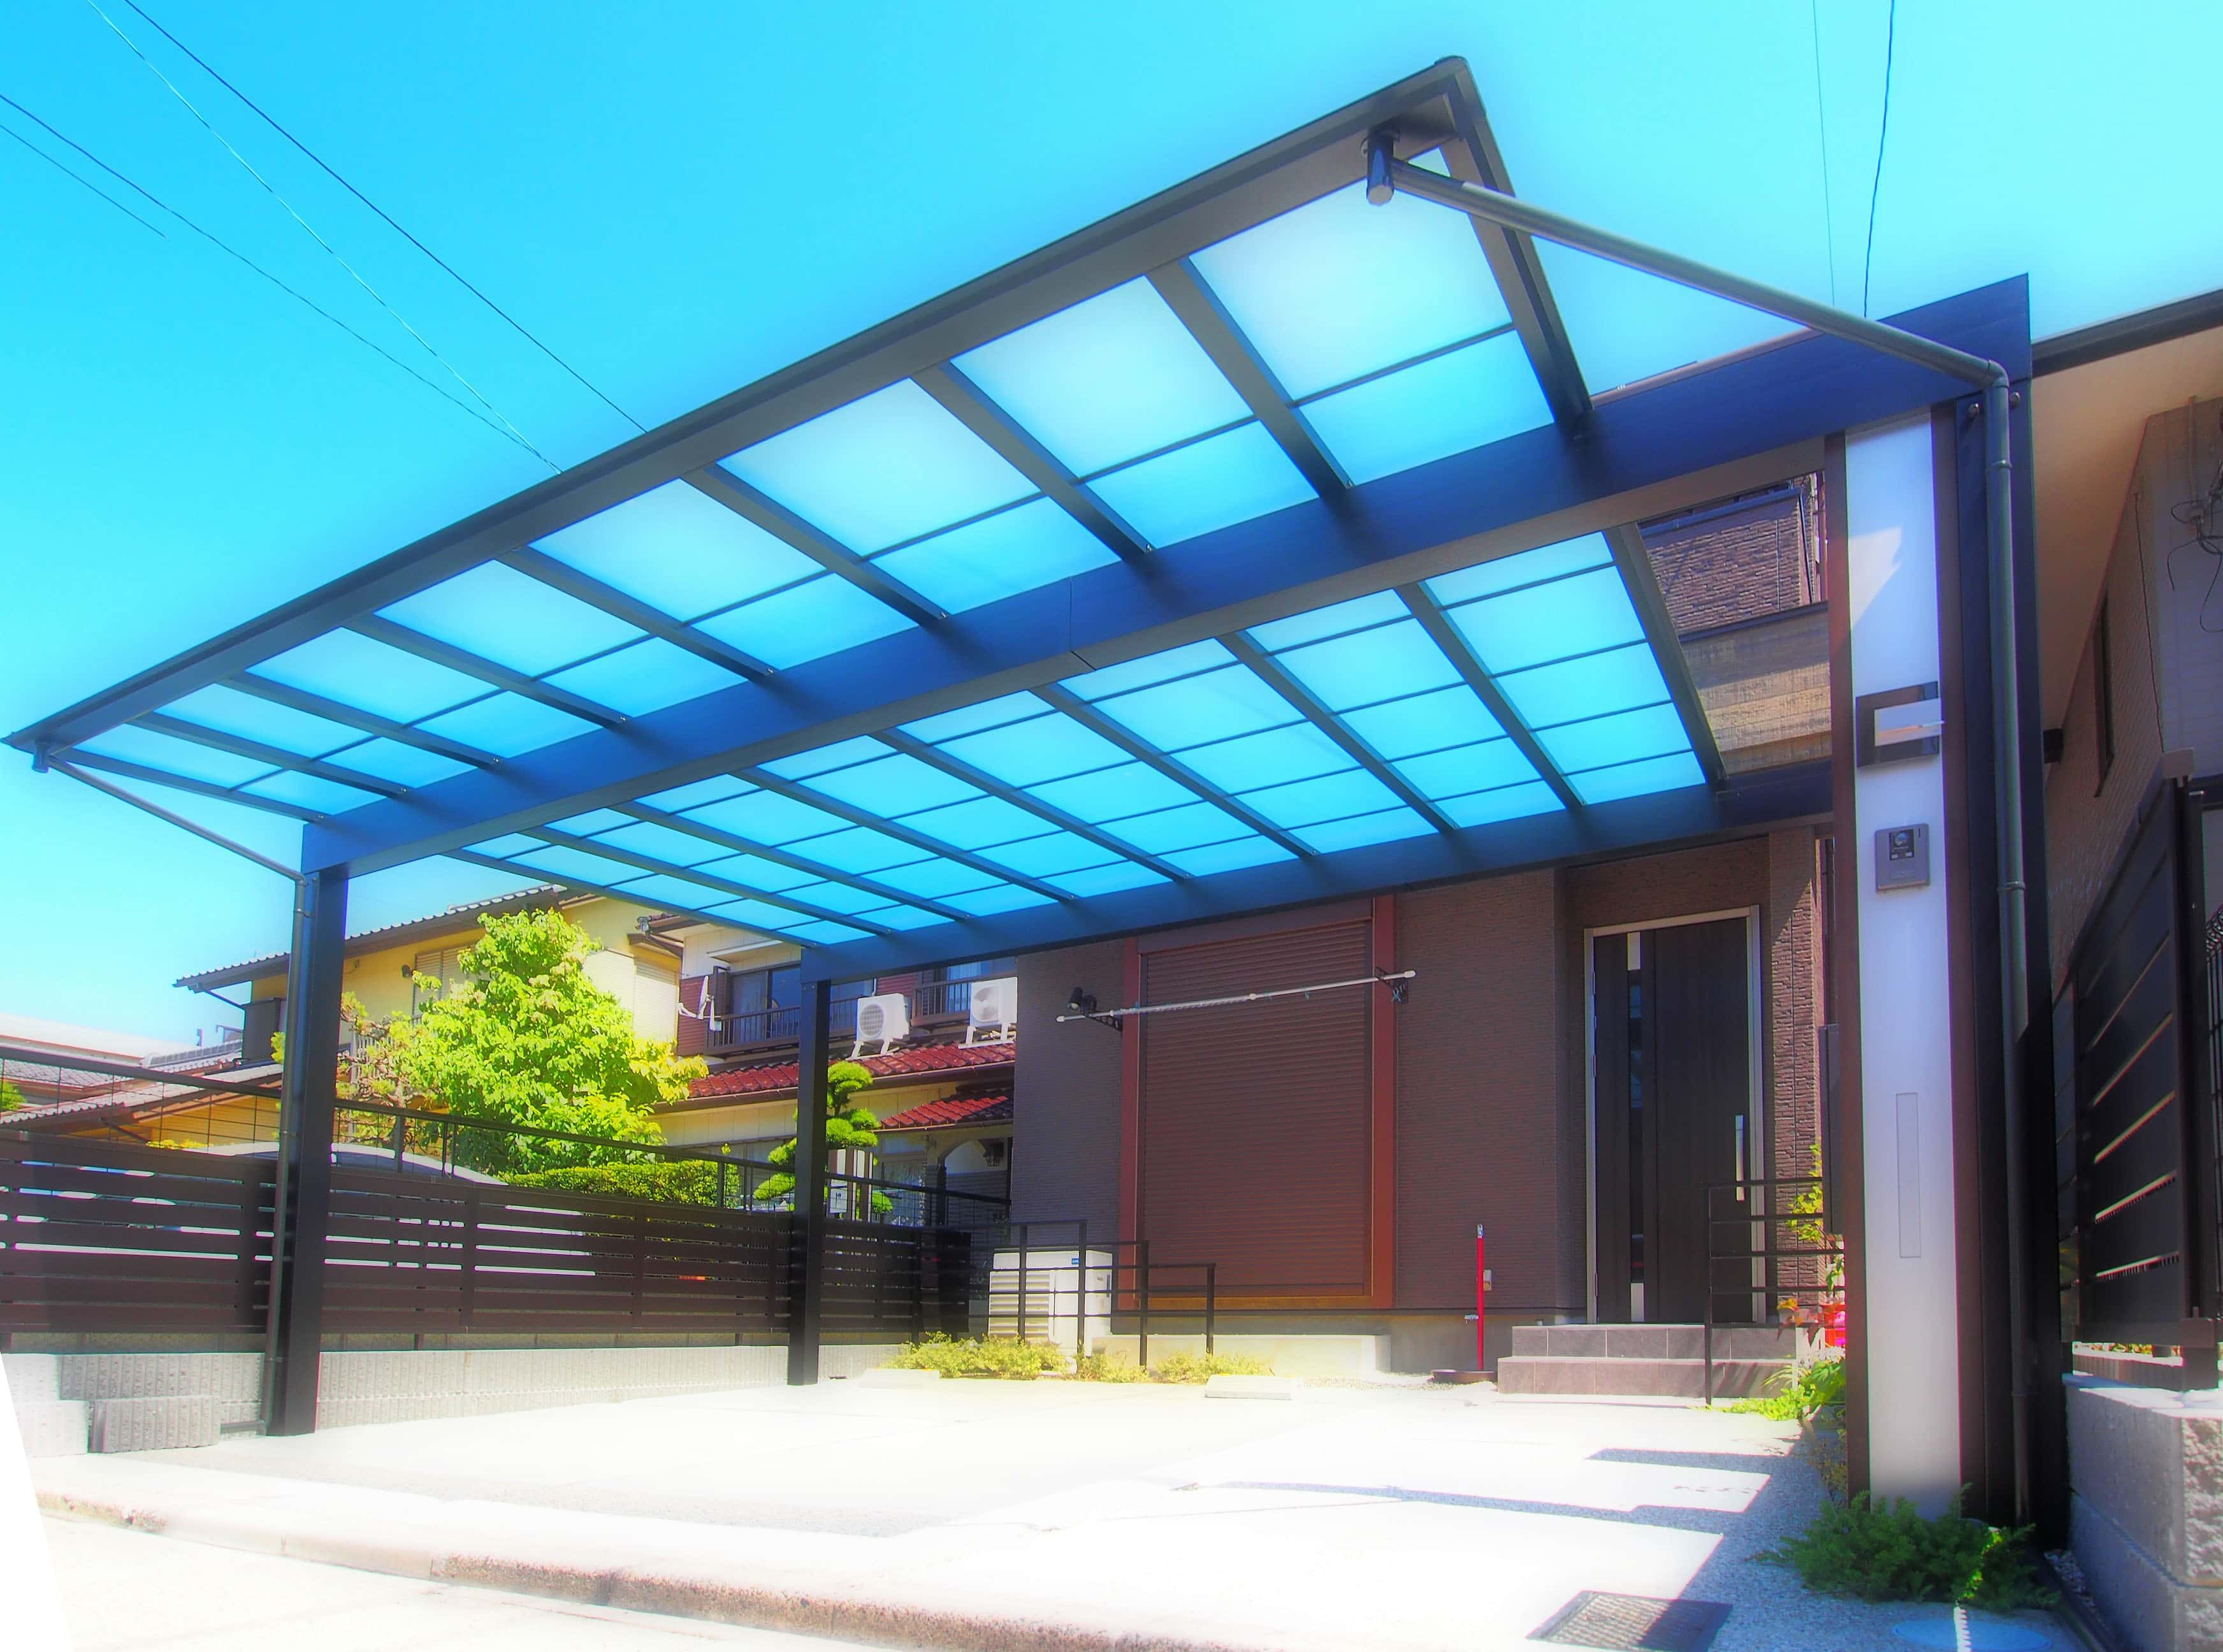 nisiku_o_voice_hiyou_manzoku 自分たちの思いを形にしてくれて大満足です。名古屋市西区/O邸